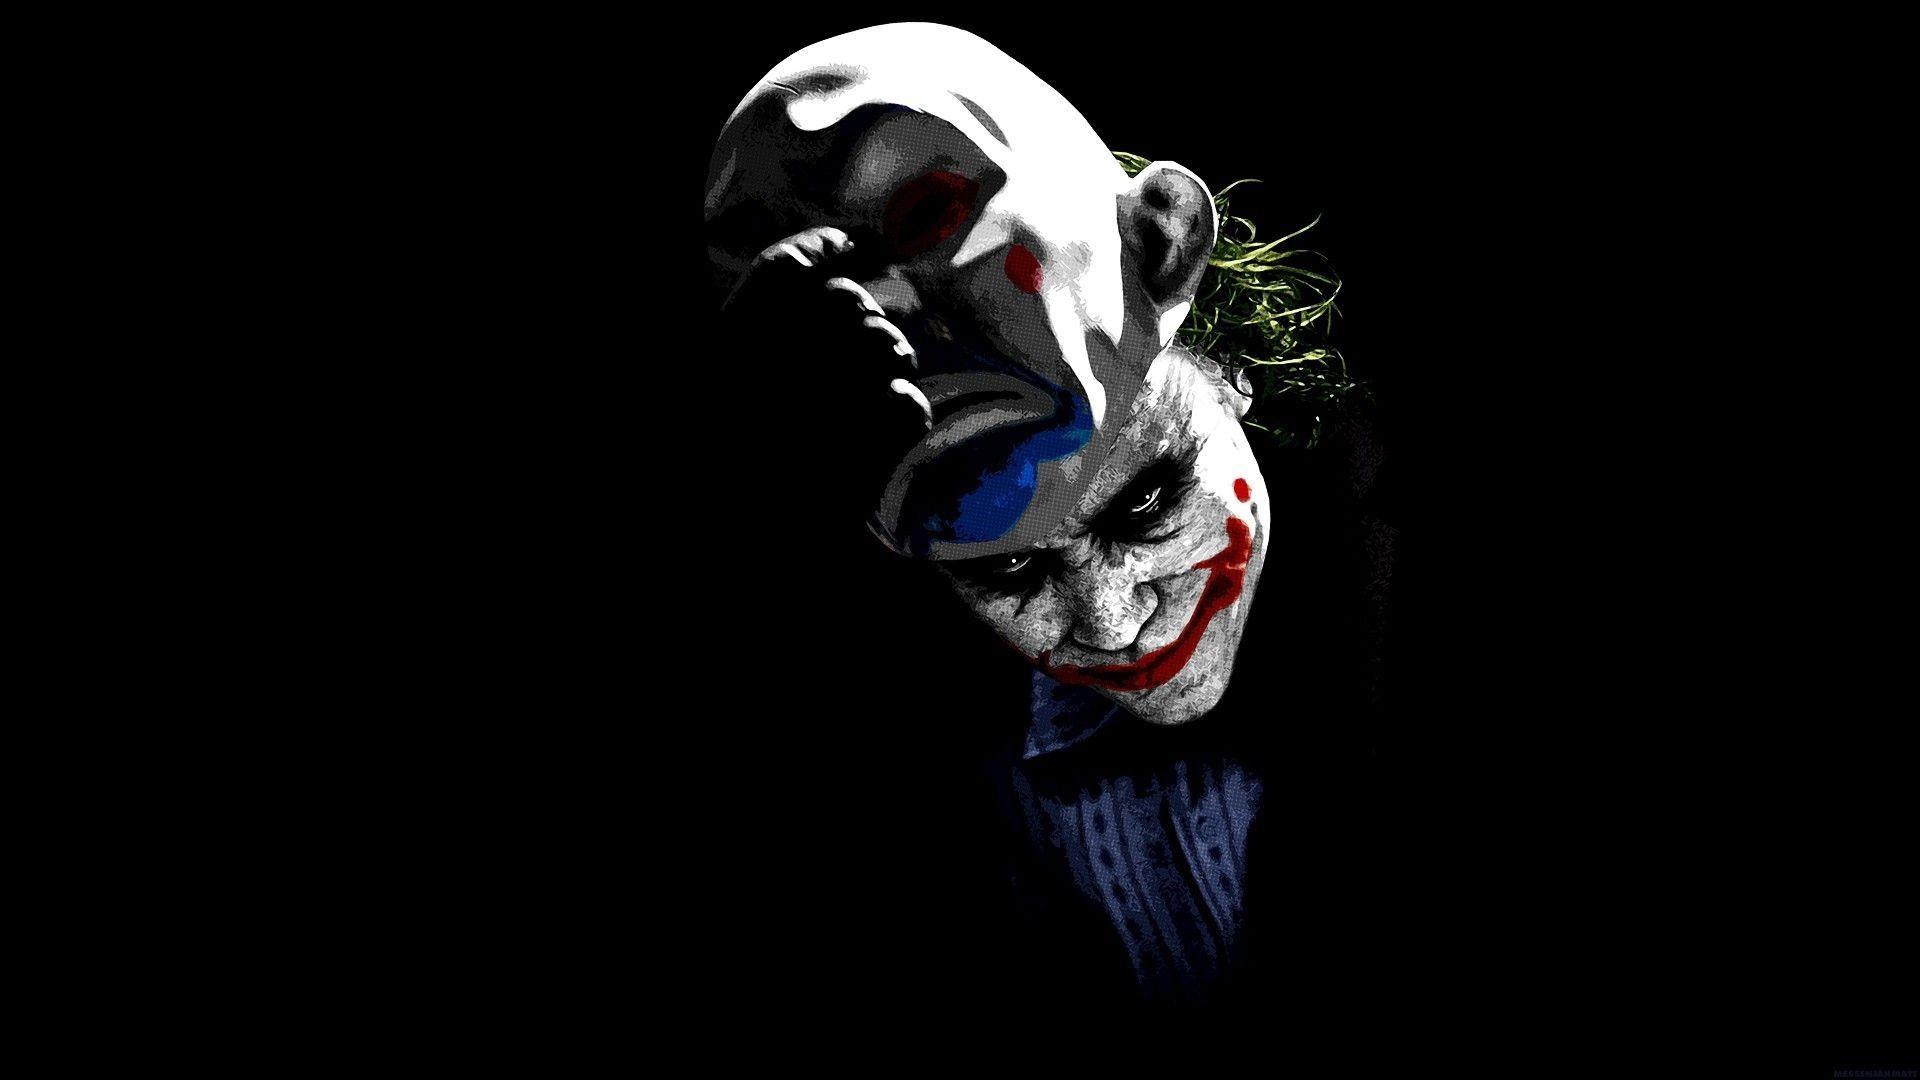 Wallpaper Joker (41 Wallpapers)